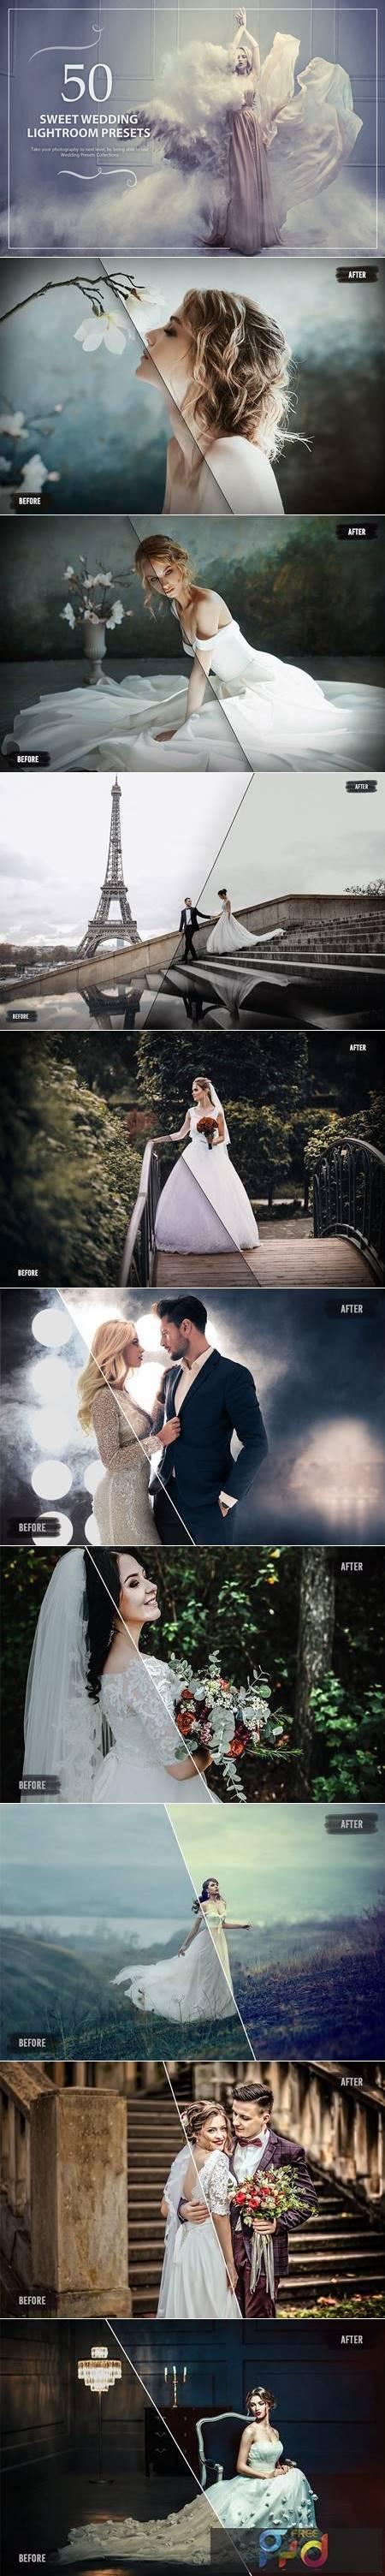 50 Sweet Wedding Lightroom Presets KC5AJMZ 1